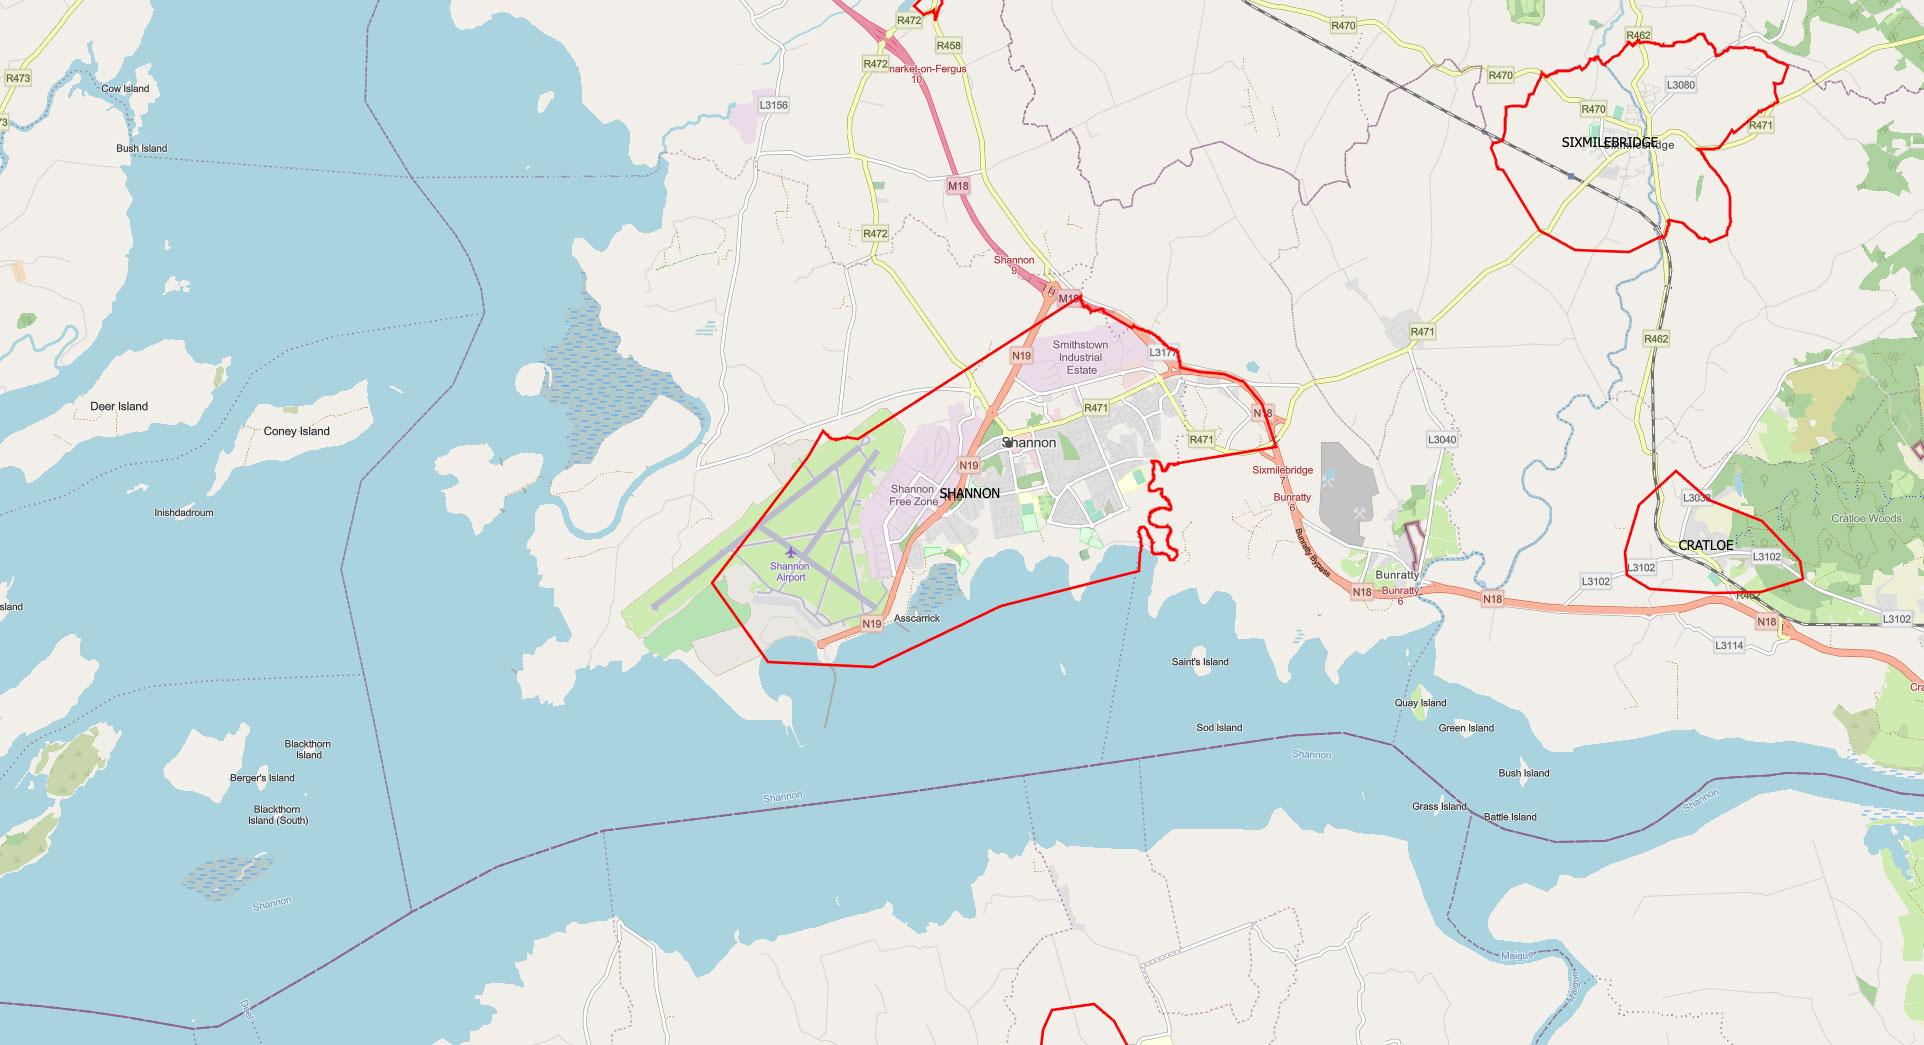 Solar-panels-shannon-clare-ireland-map-image